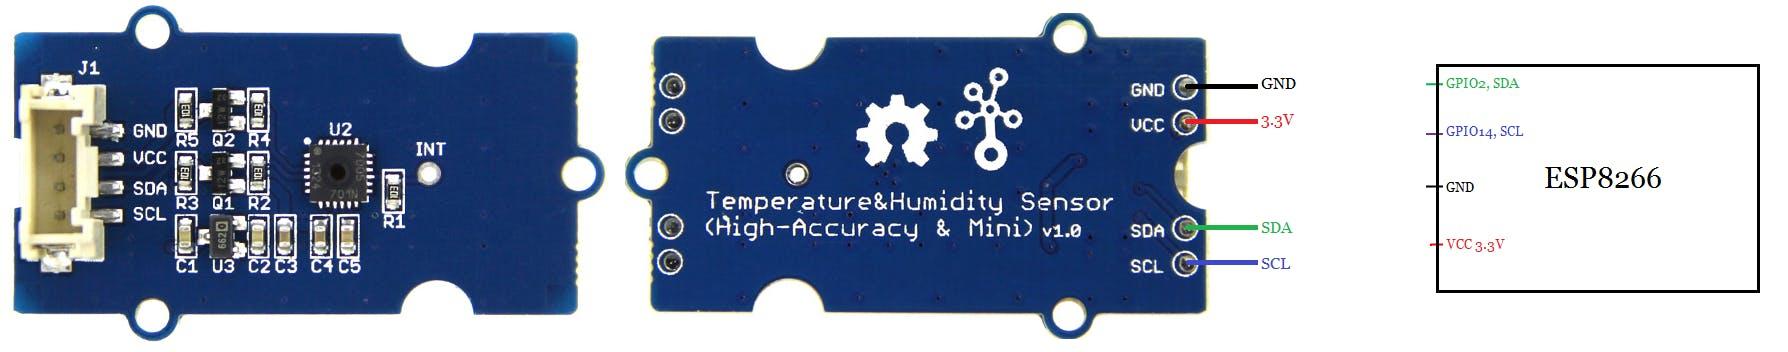 TH02 Temperature and Humidity Sensor Interfacing with ESP8266